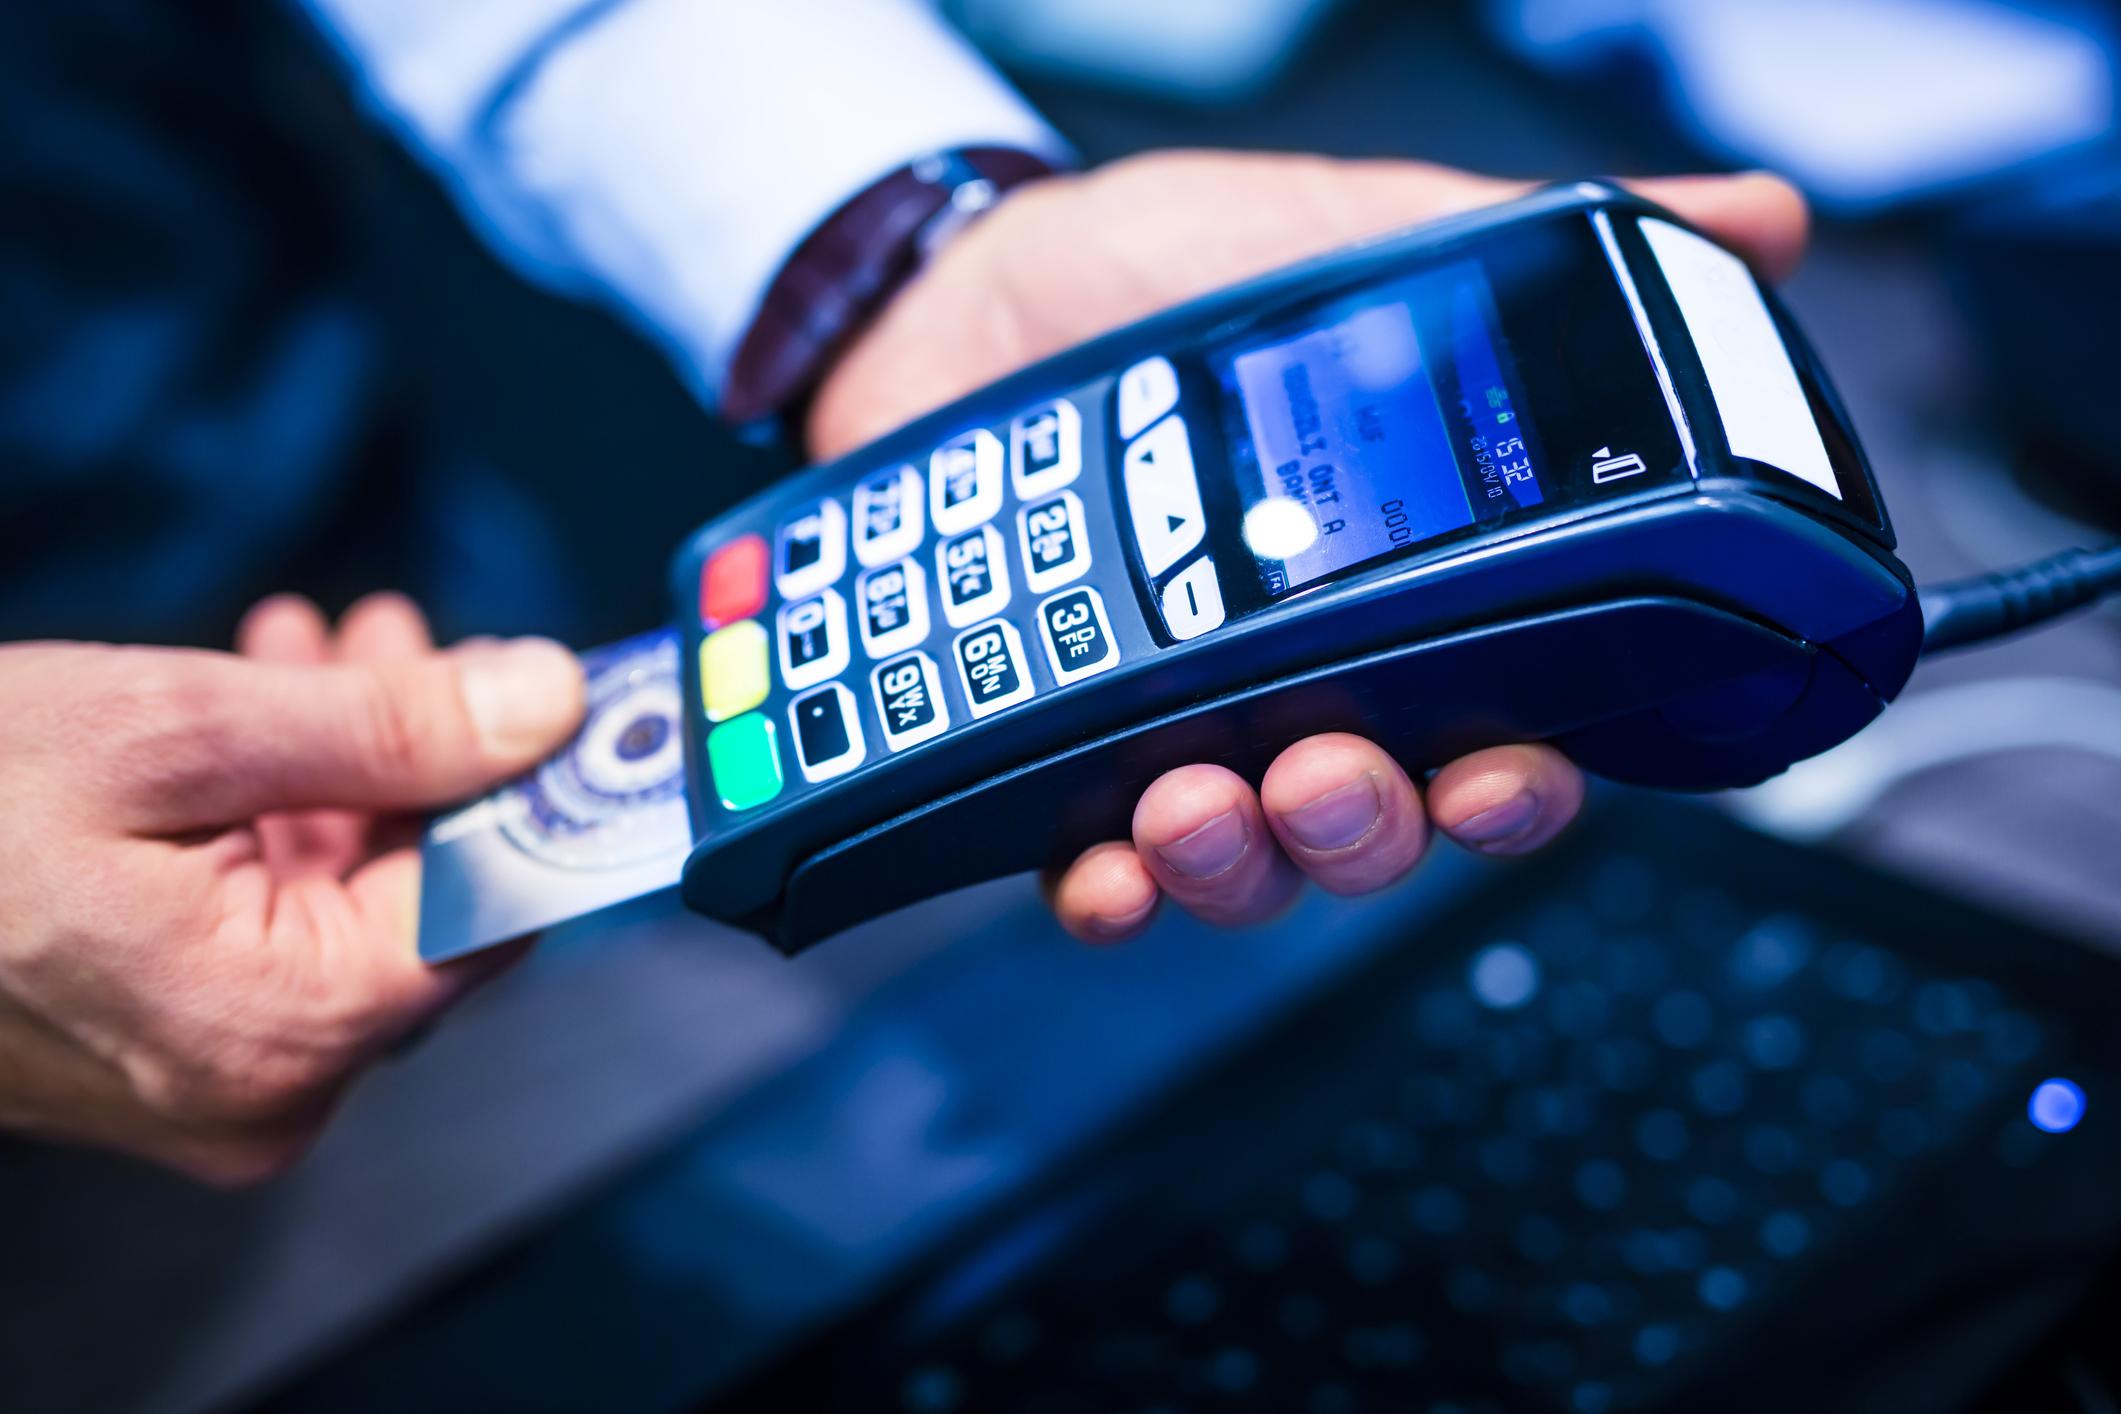 Man inserting credit card into machine